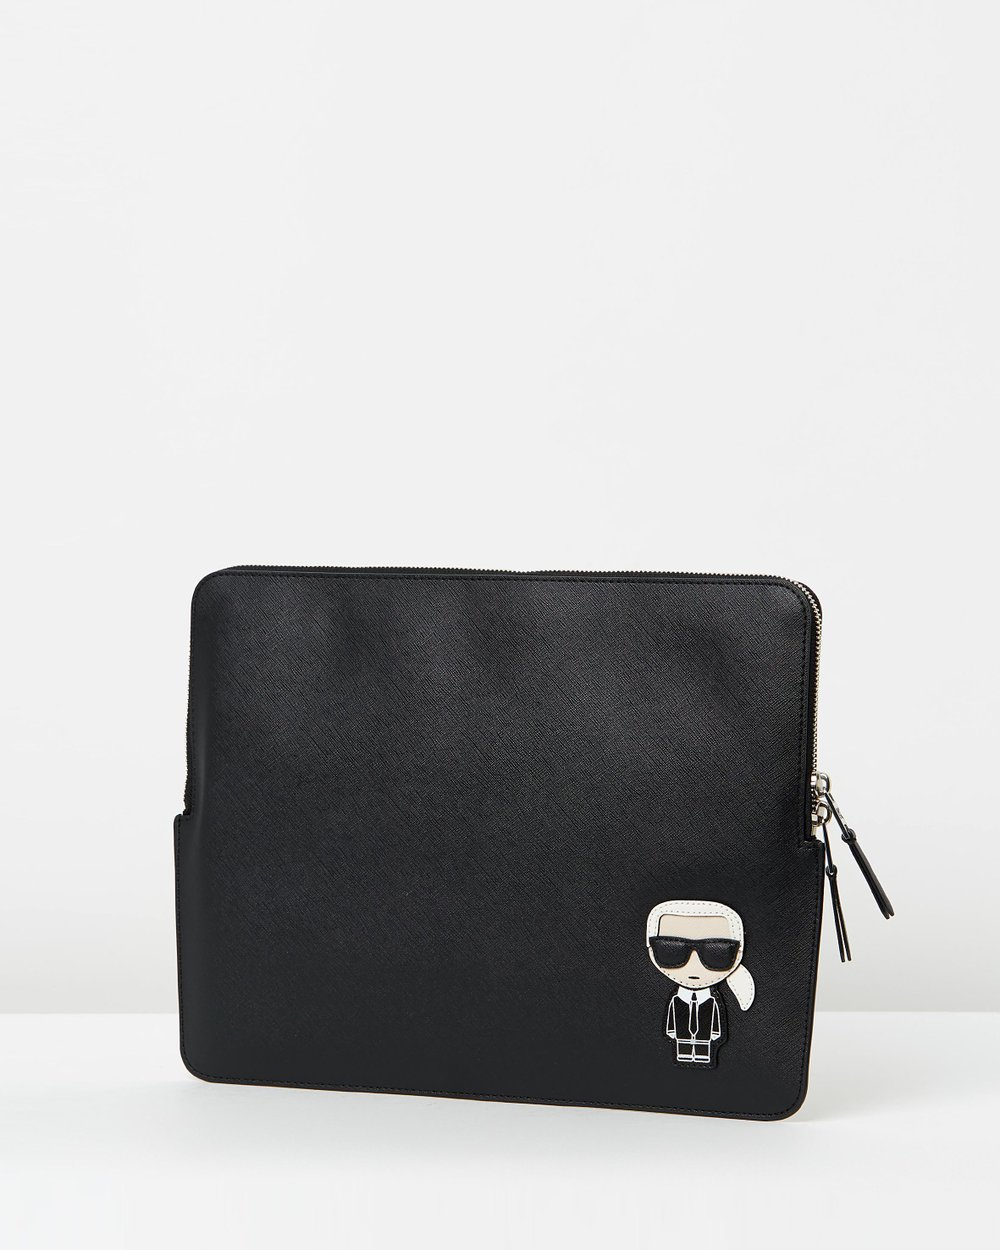 9cb22ee3c5a K Ikonik Laptop Sleeve by Karl Lagerfeld Online   THE ICONIC   Australia